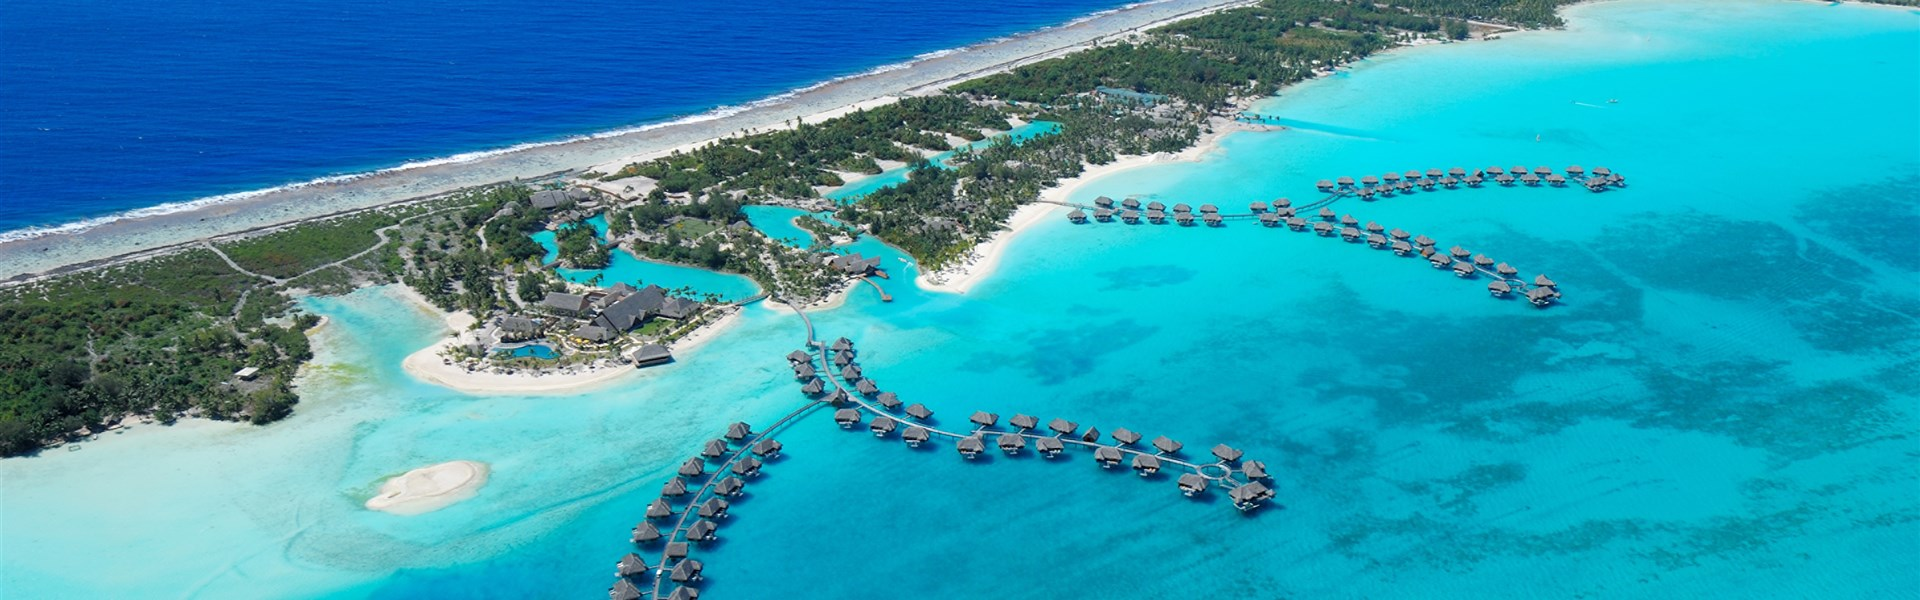 Marco Polo - Four Seasons Resort - ostrov Bora Bora -